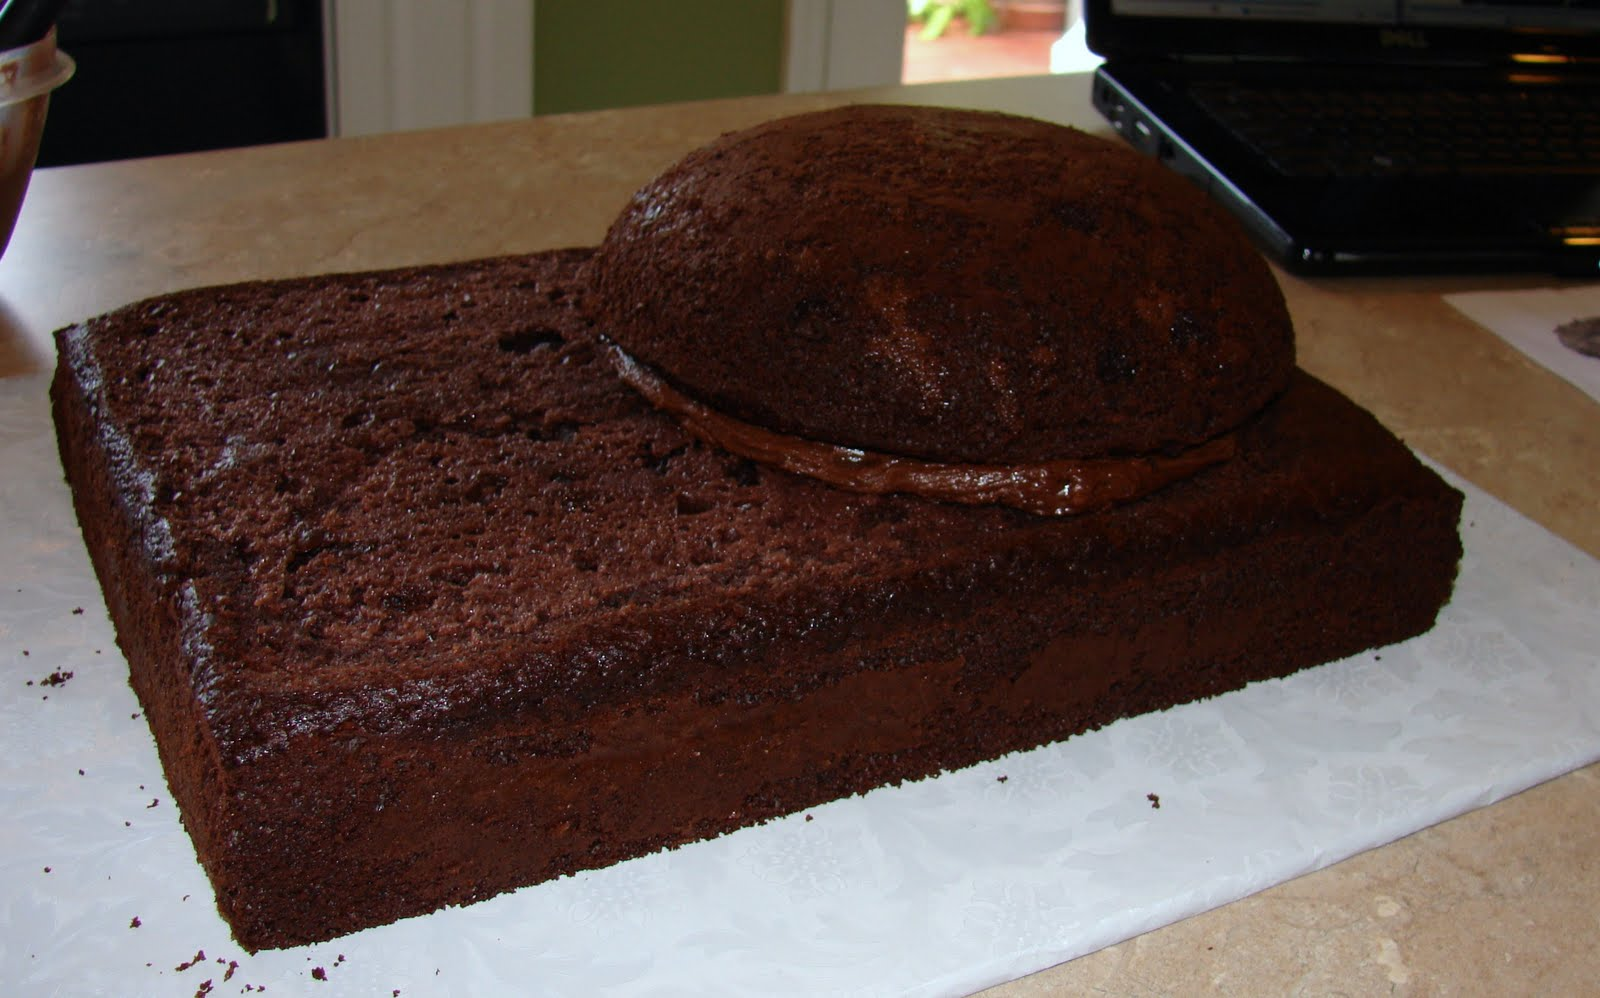 Pin Ipsy Bipsy Bake Shop Mckennas Dolphin Cake Cake On